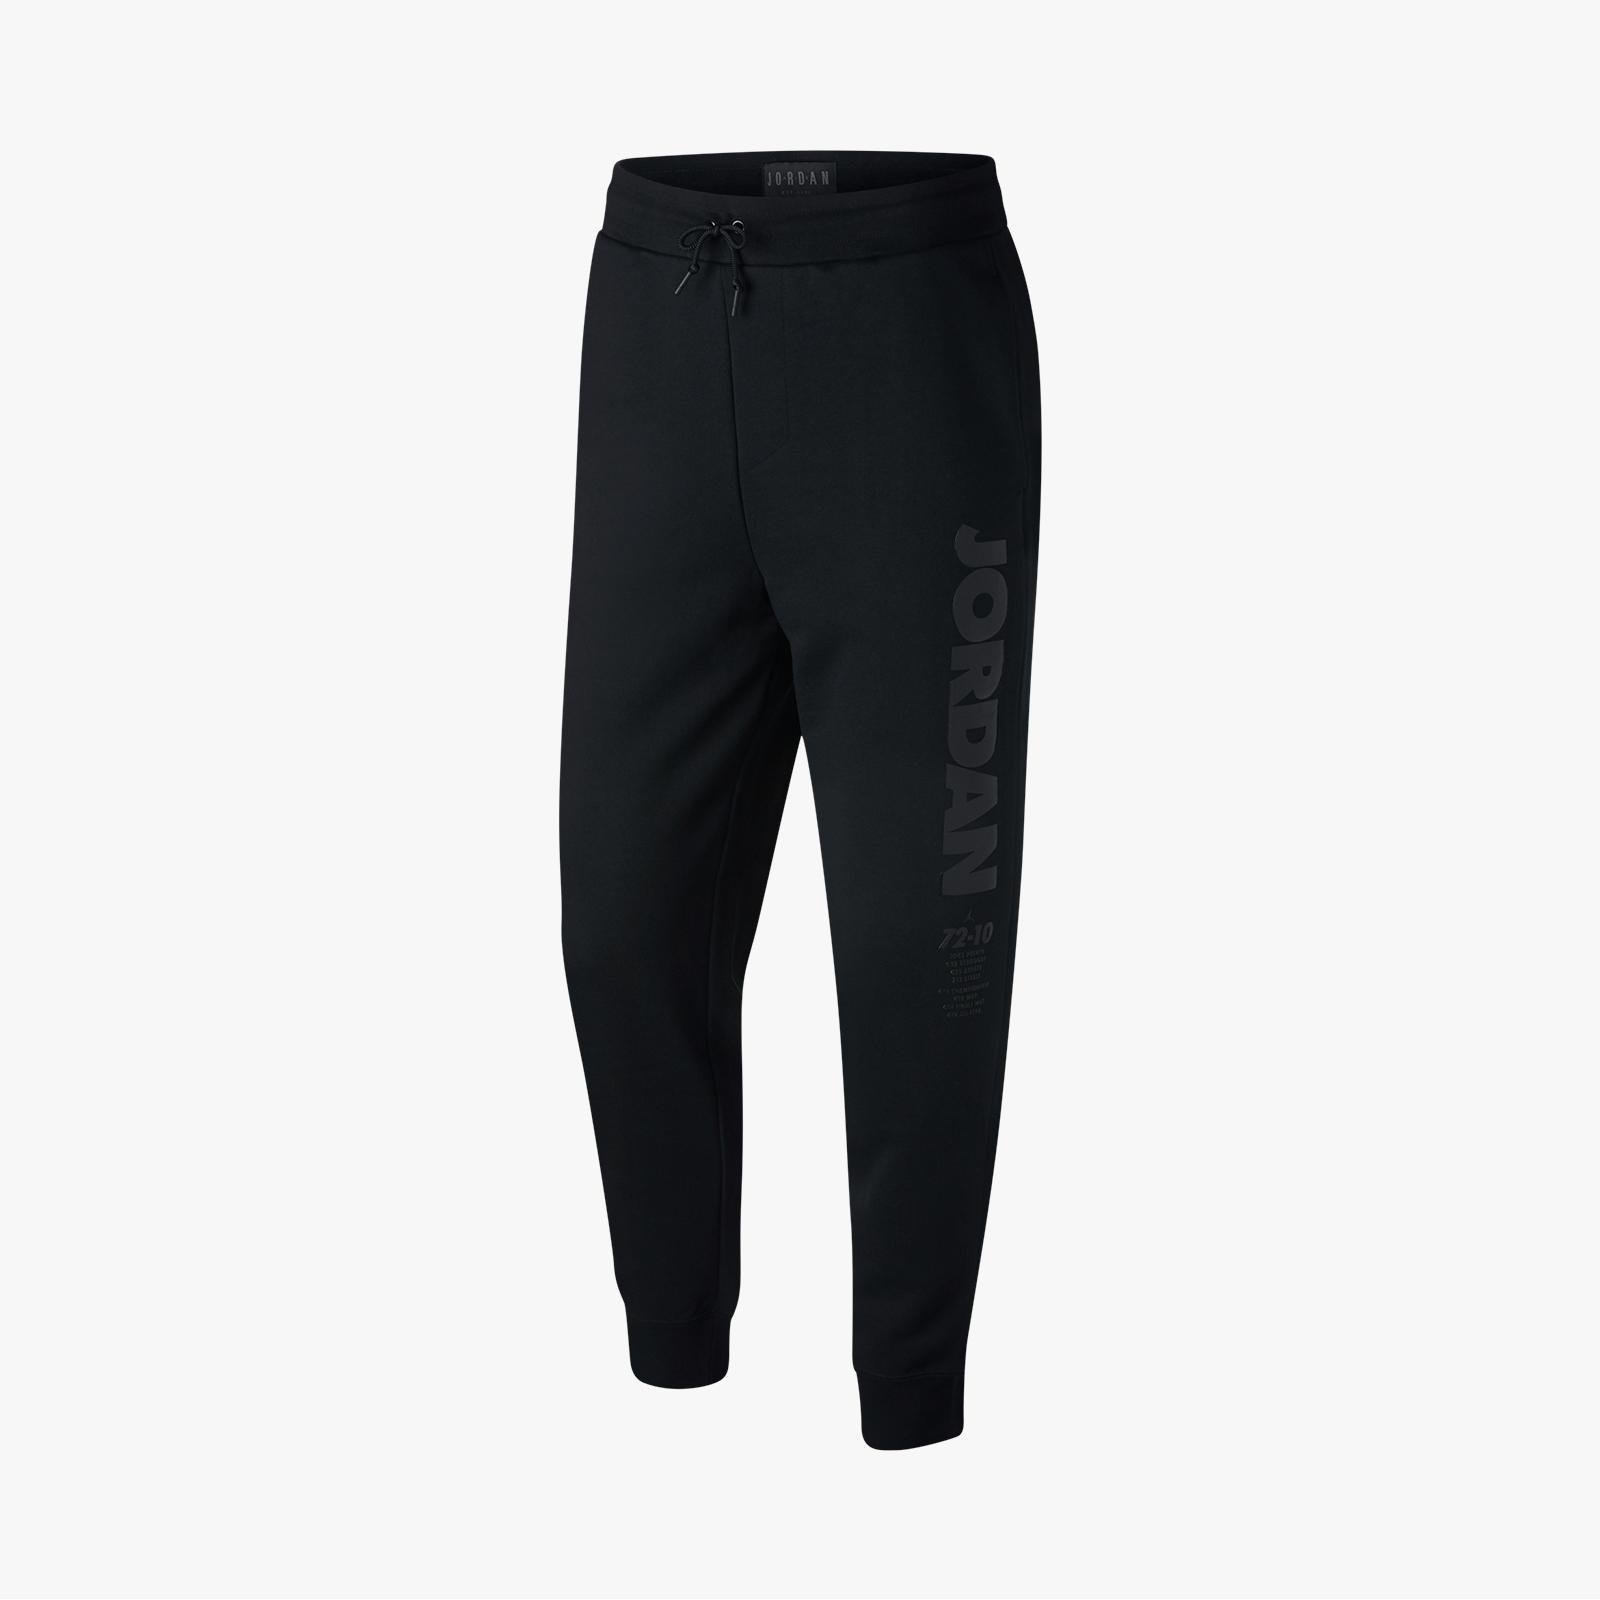 a8f75b6452297d Jordan Brand Legacy AJ11 Fleece Pant - Bq0195-010 - Sneakersnstuff ...